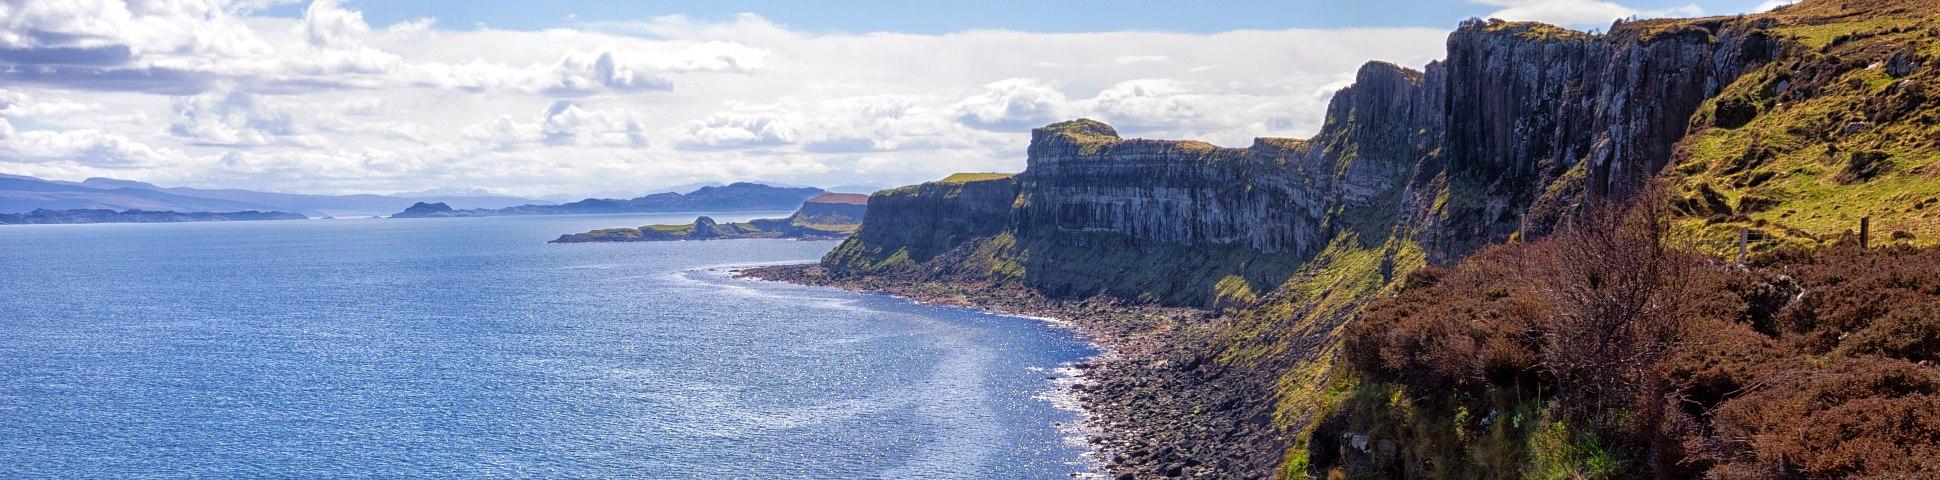 Rugged shores of Scottish Isles